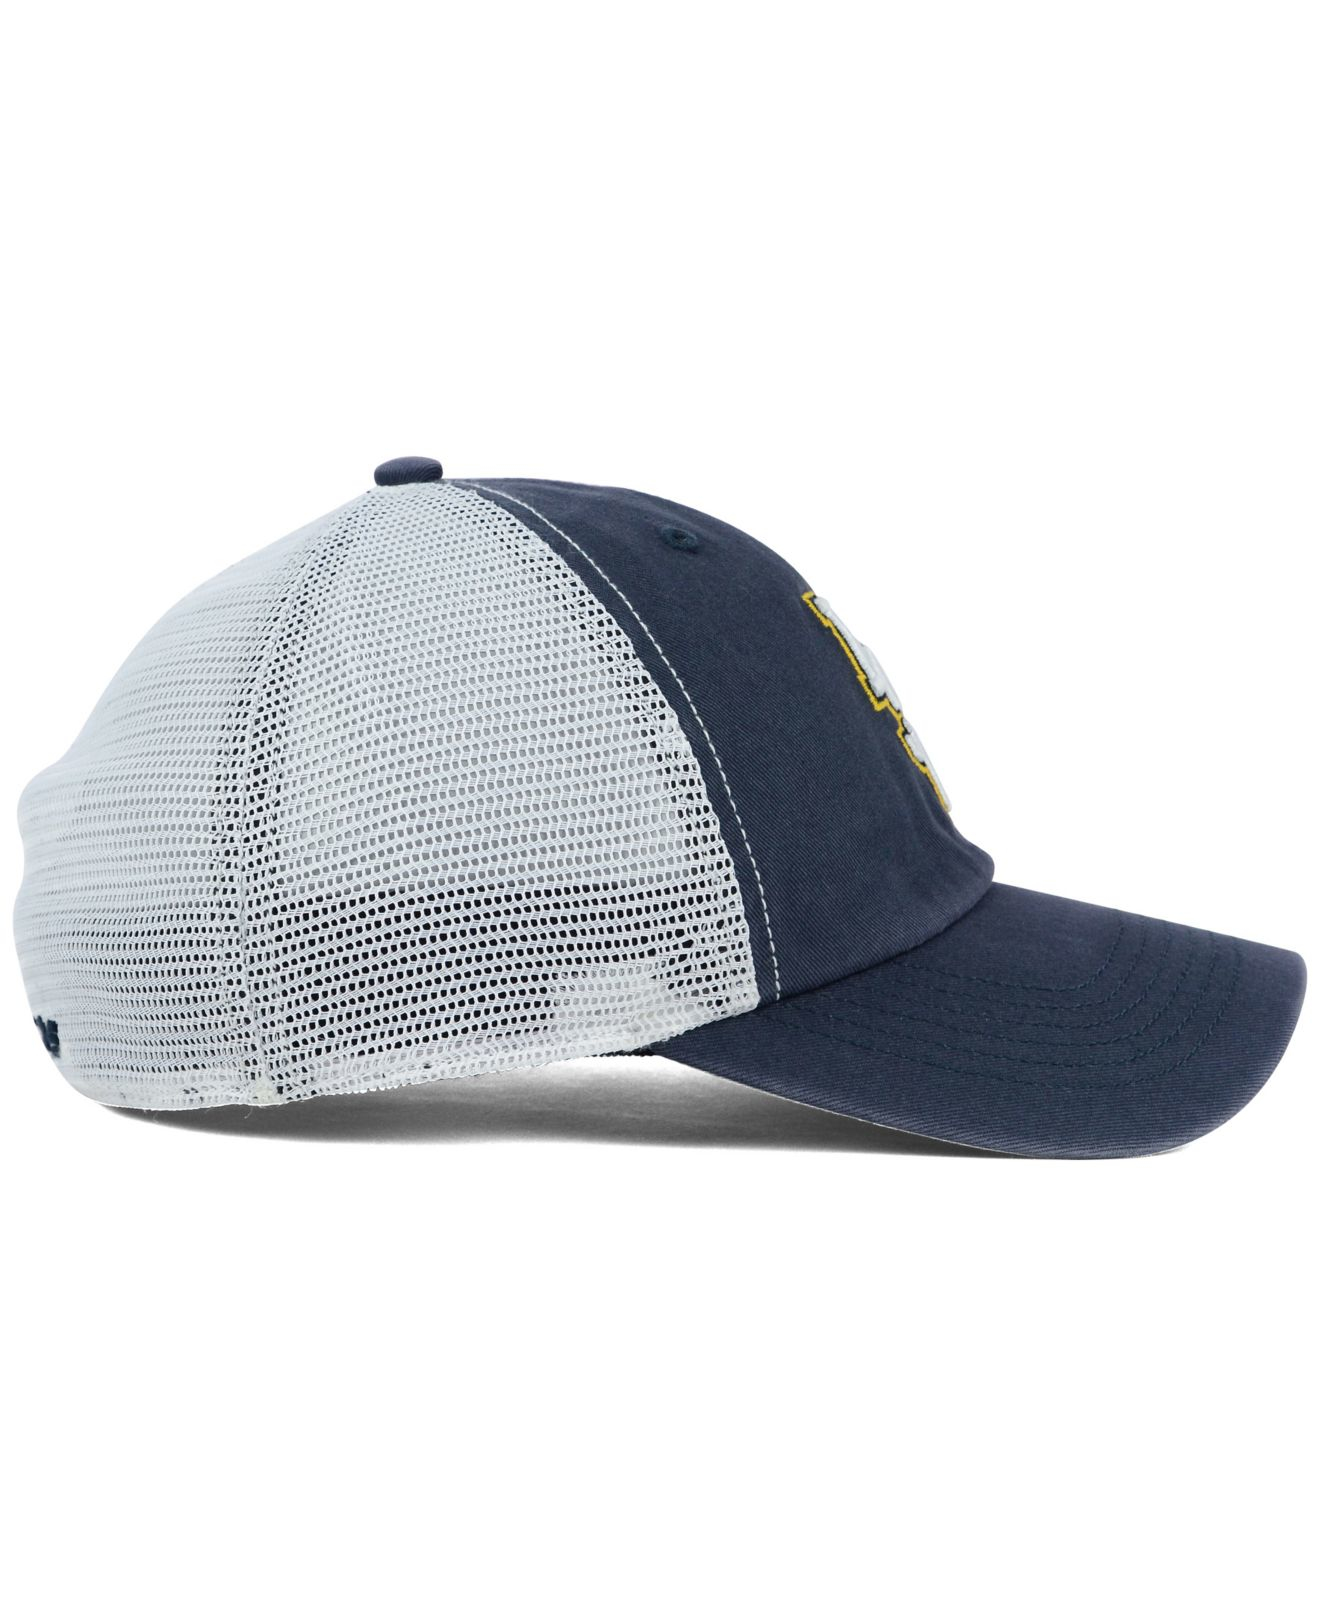 45cd59b18e546 ... good lyst 47 brand lsu tigers stretch fit griffin cap in blue for men  2dee4 d455d